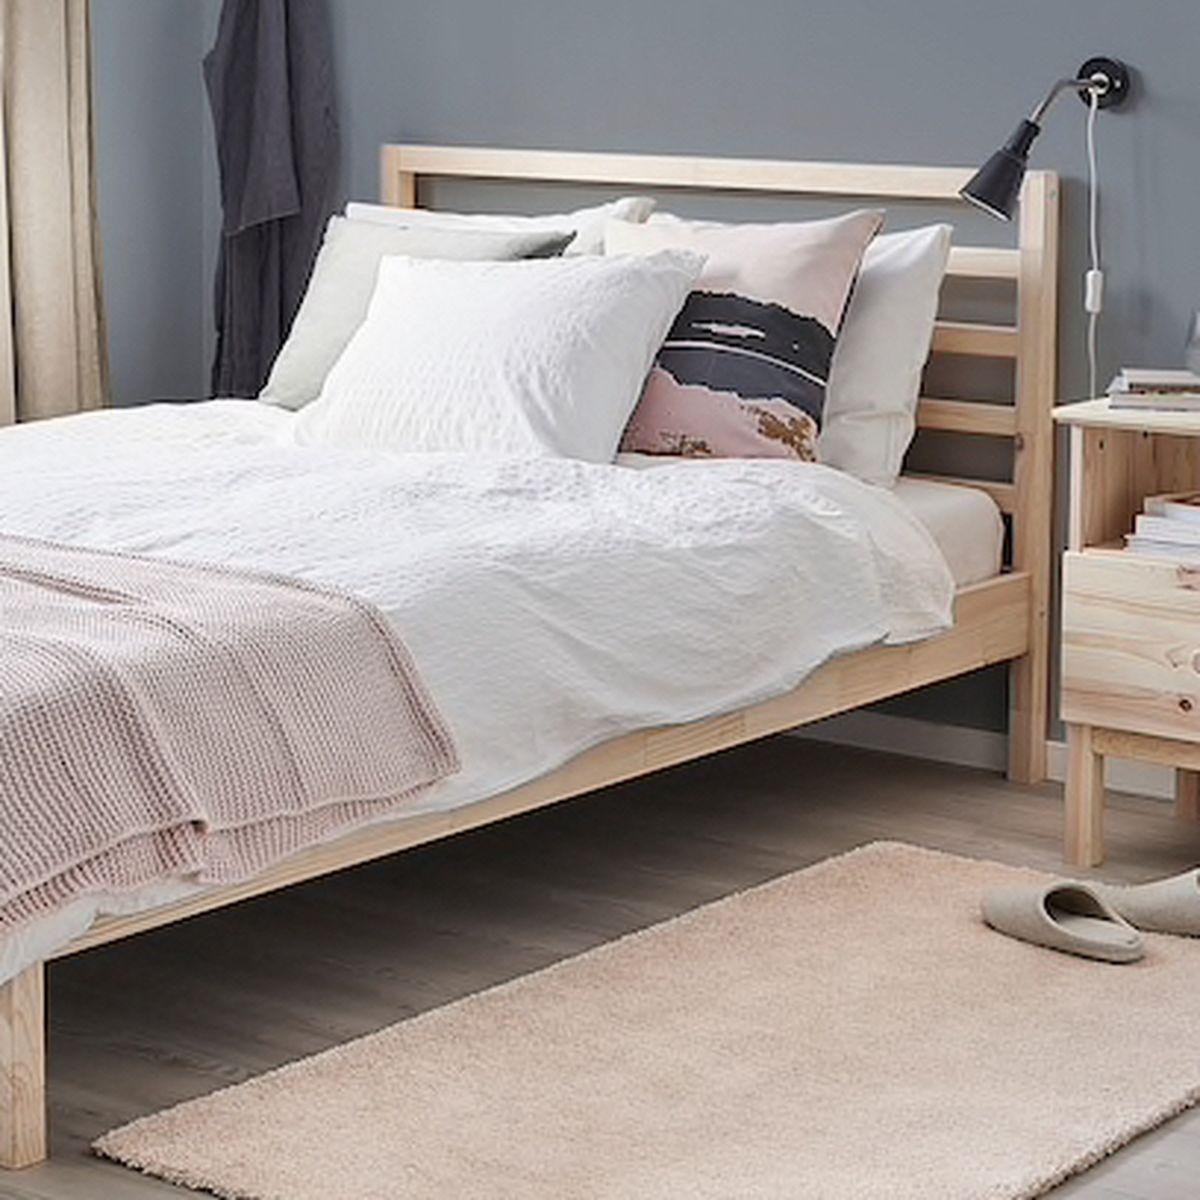 Bedroom Ideas Under 100 Ikea Affordable Decor